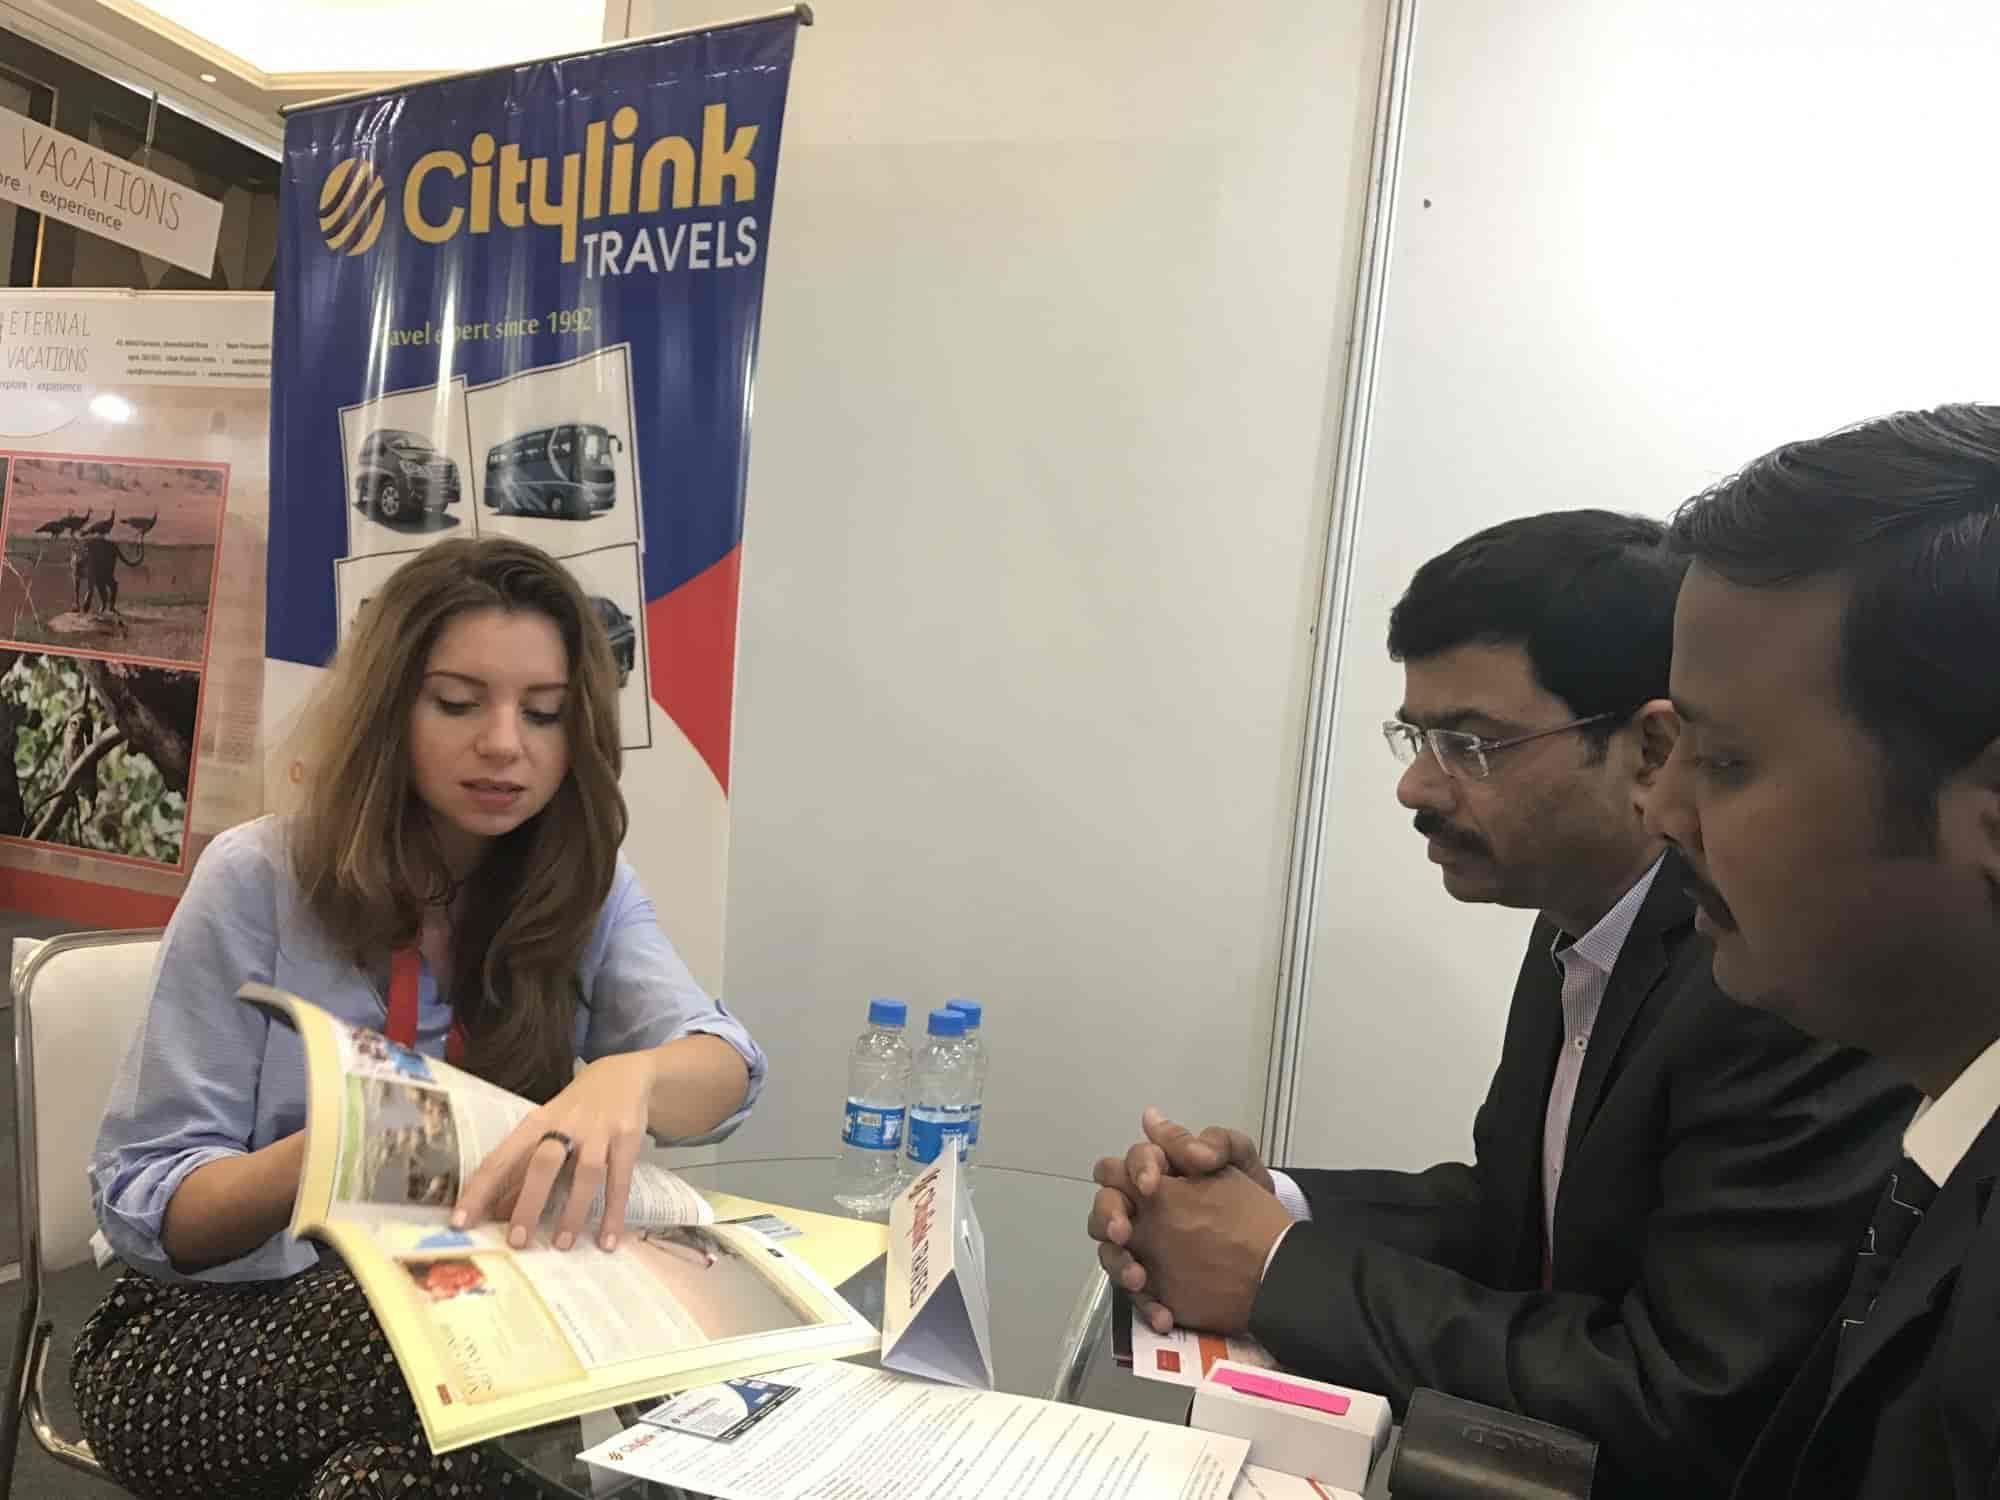 Online store Citylink: customer and staff feedback